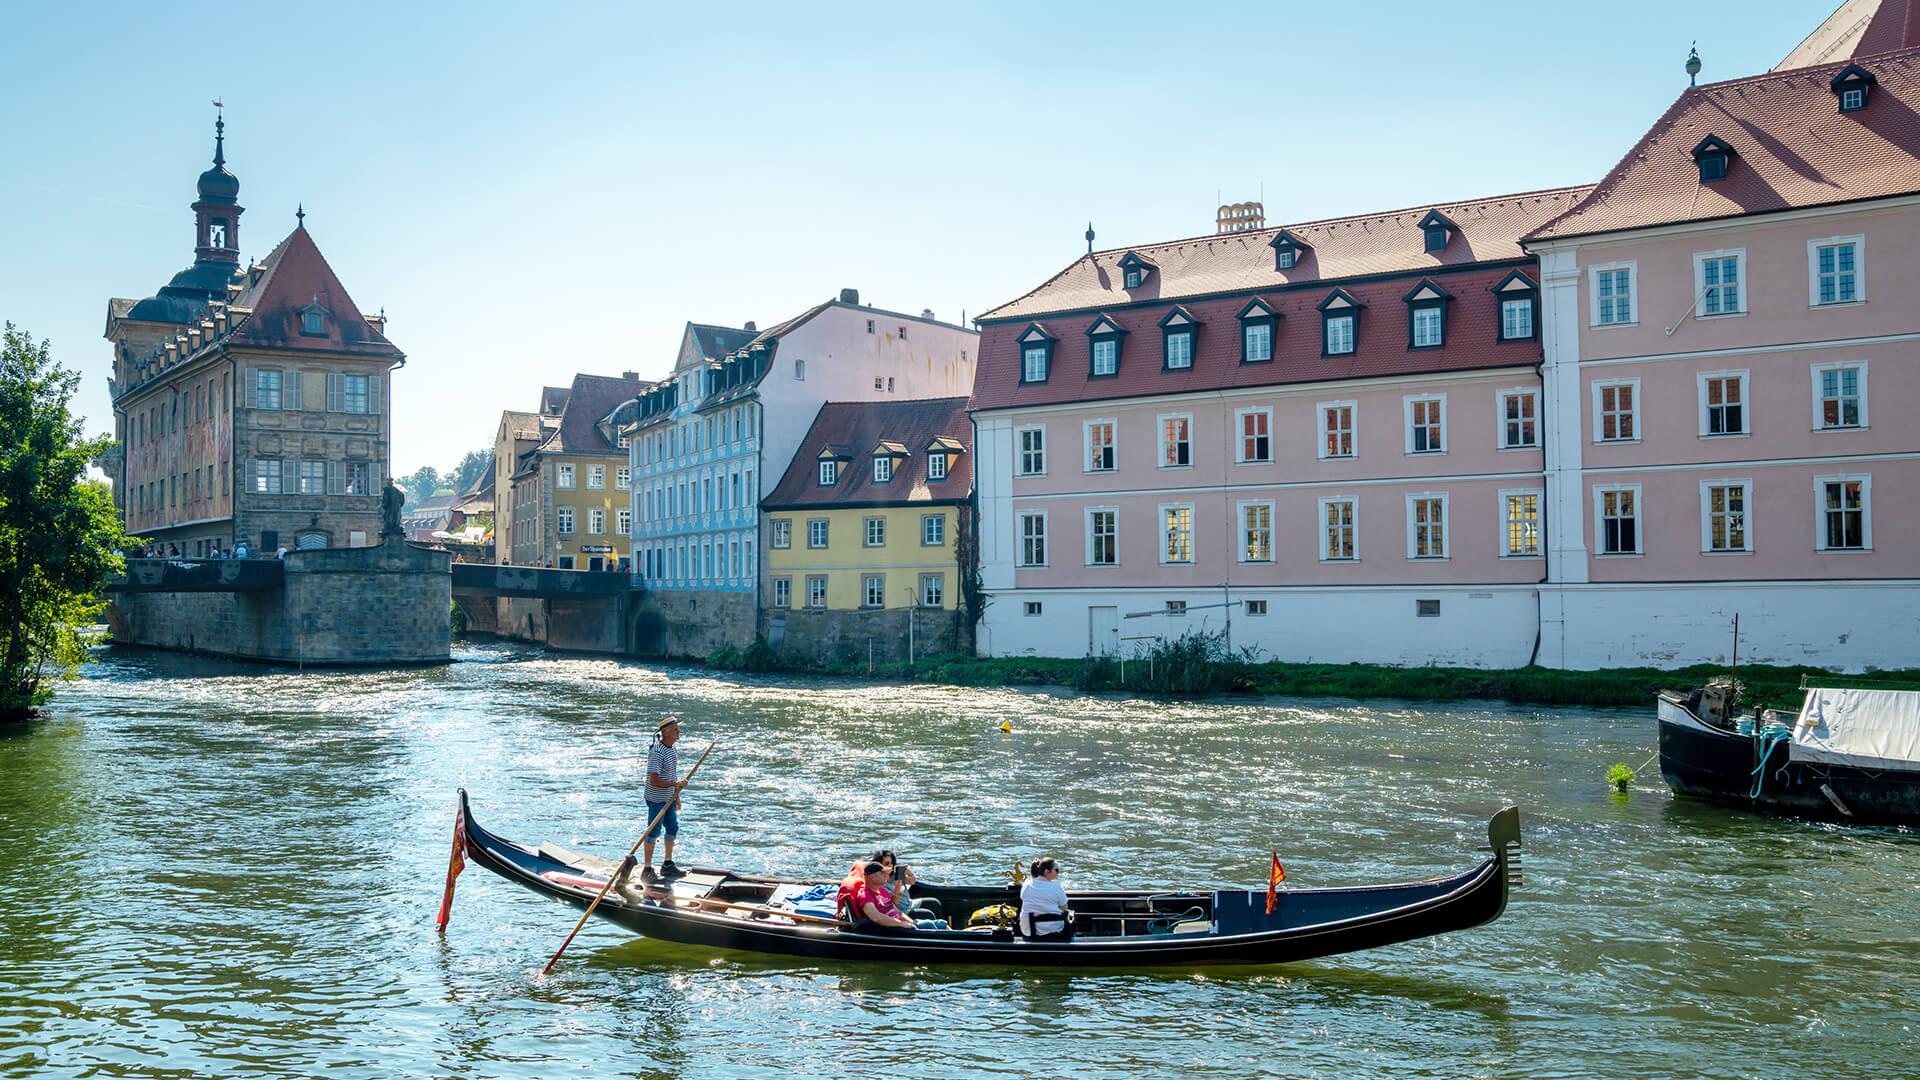 Bamberg: balade en gondole à travers Bamberg sur le Regnitz